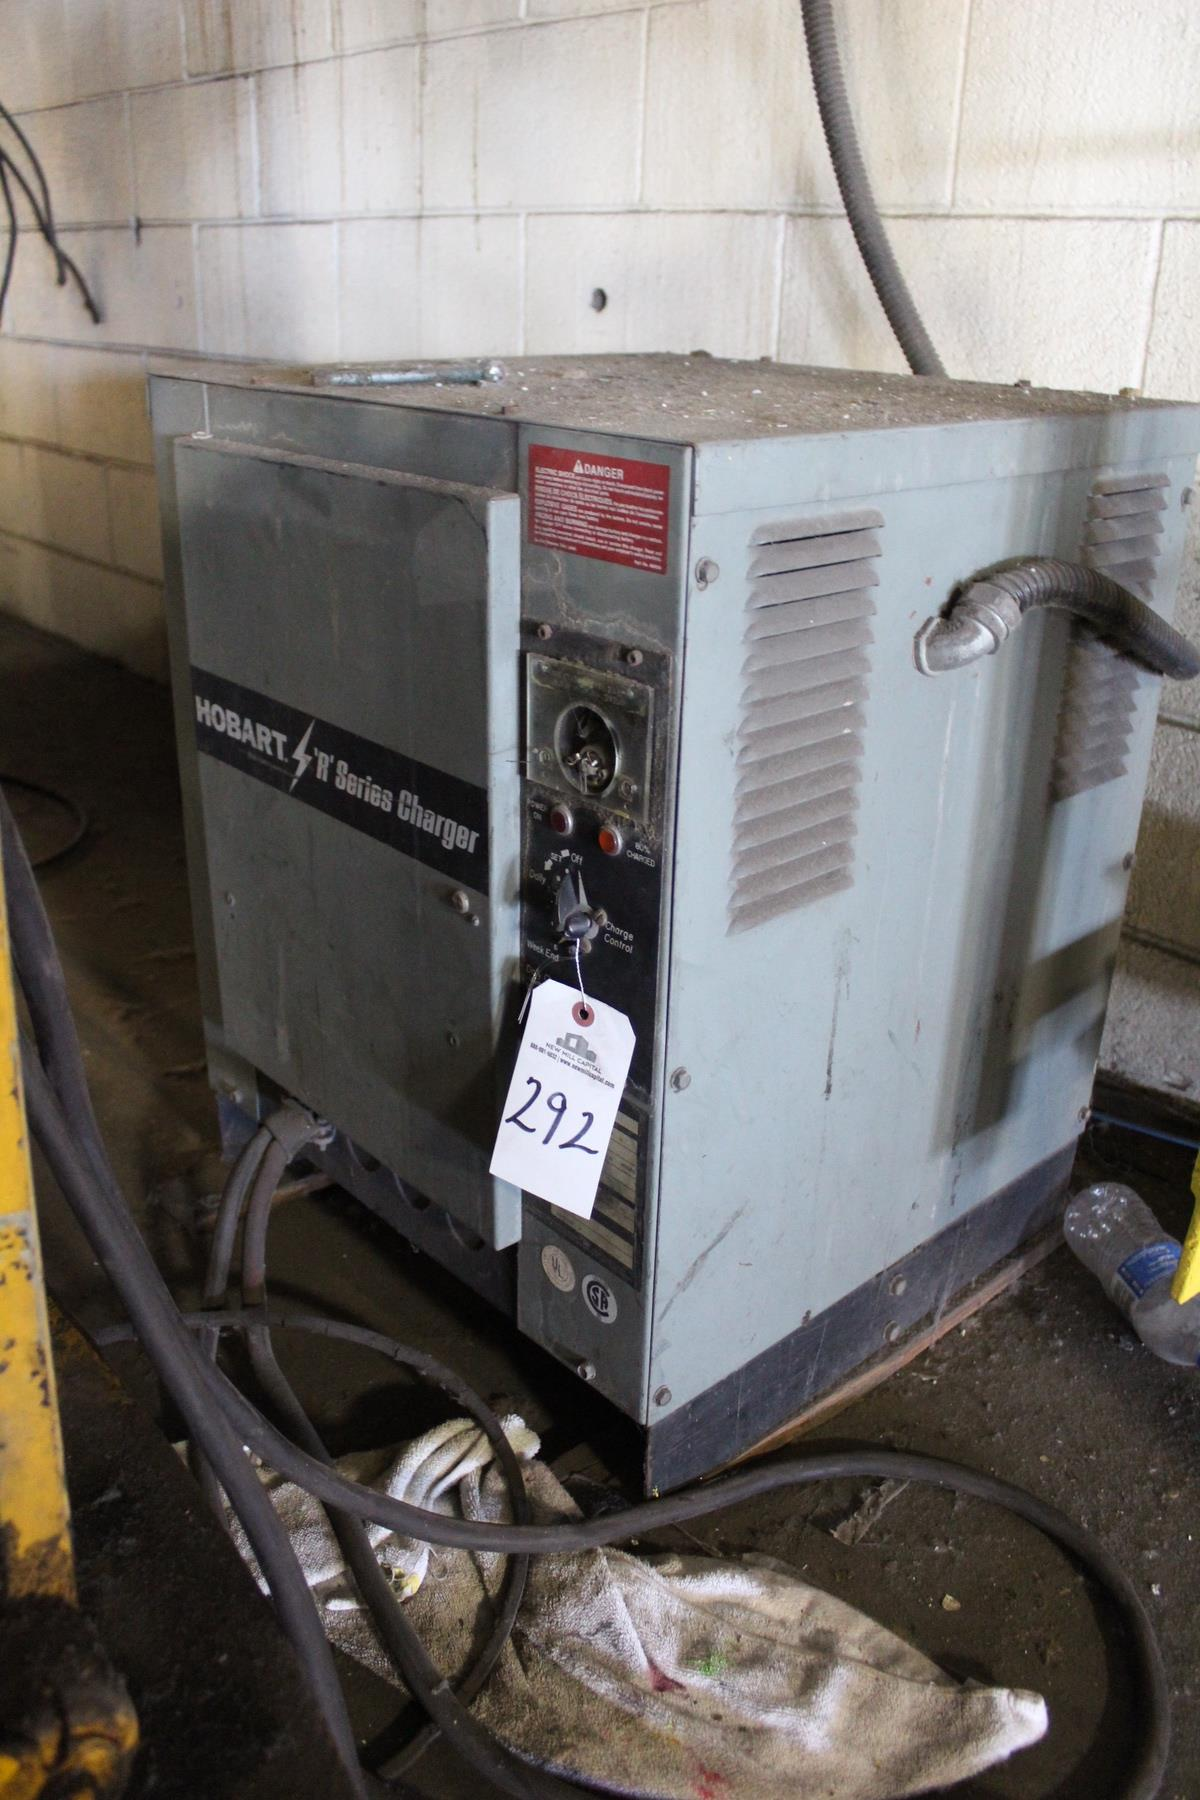 Hobart Battery Charger,12 Volt, S/N 1B7C502809   Rig Fee: $25